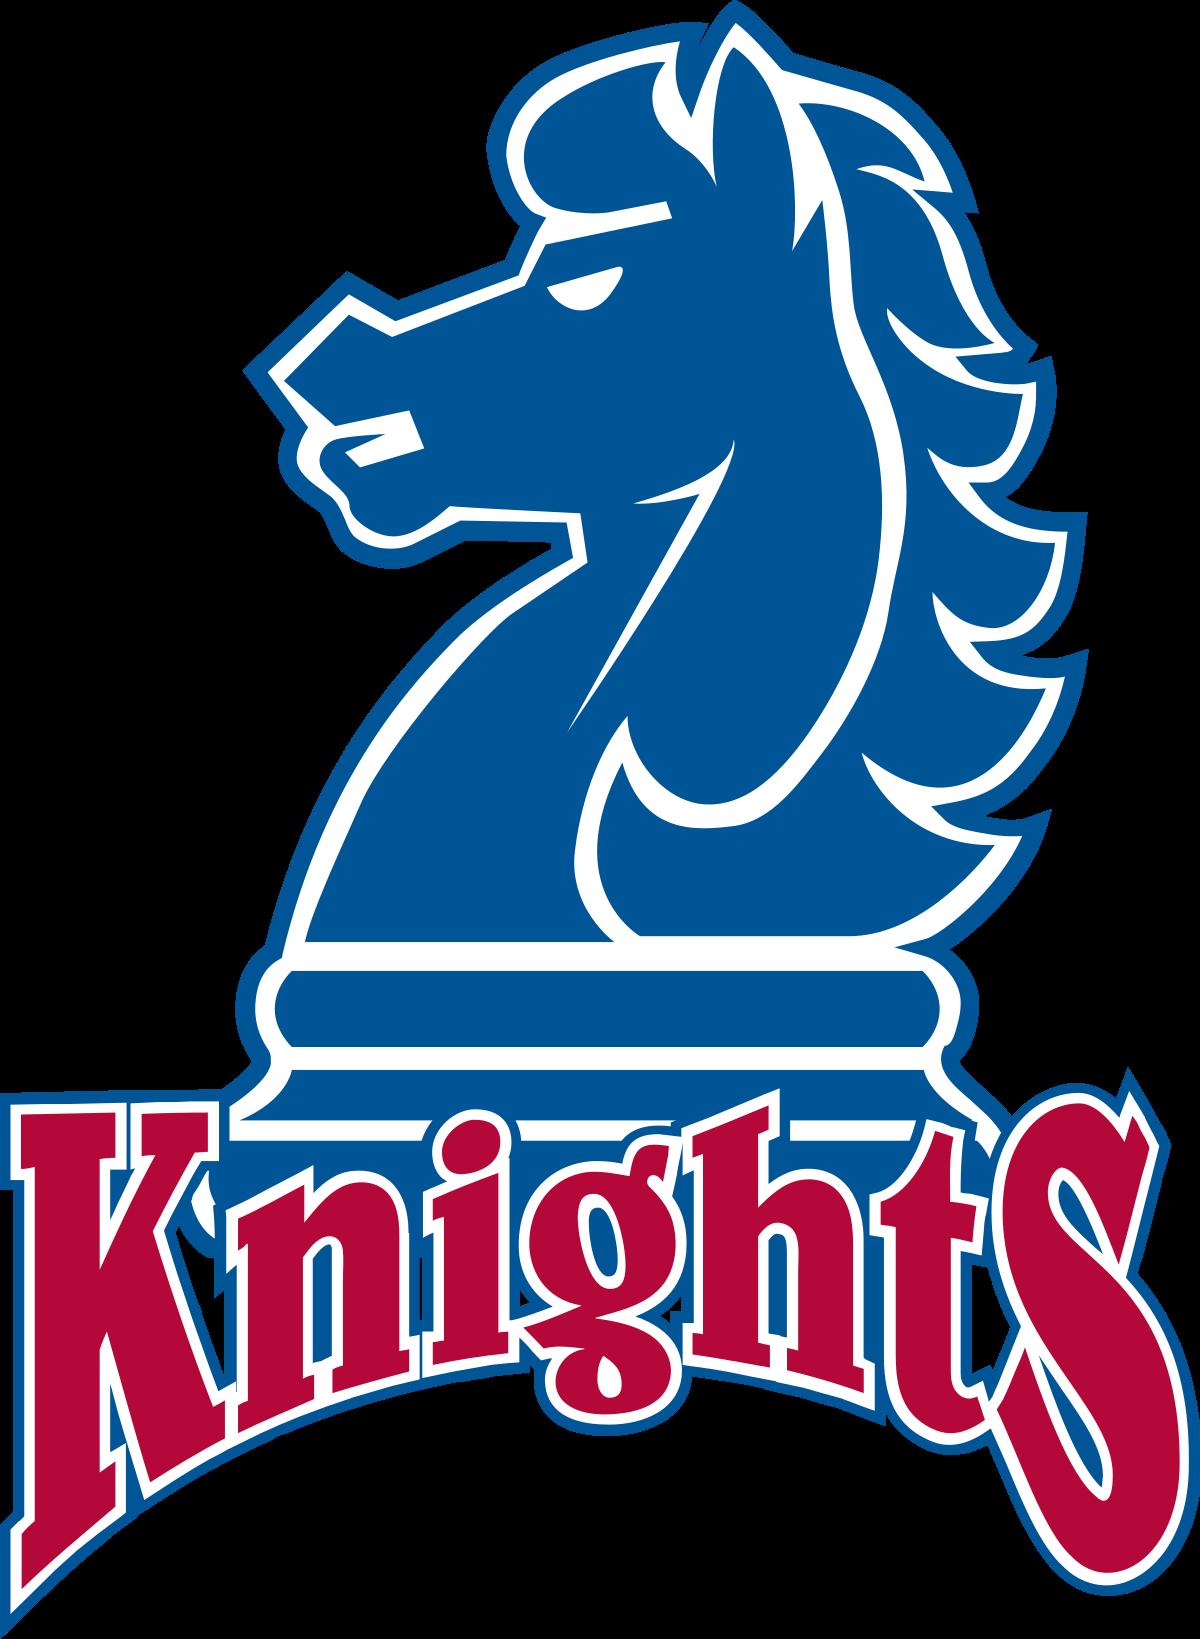 1200px-FDU_Knights_logo.svg